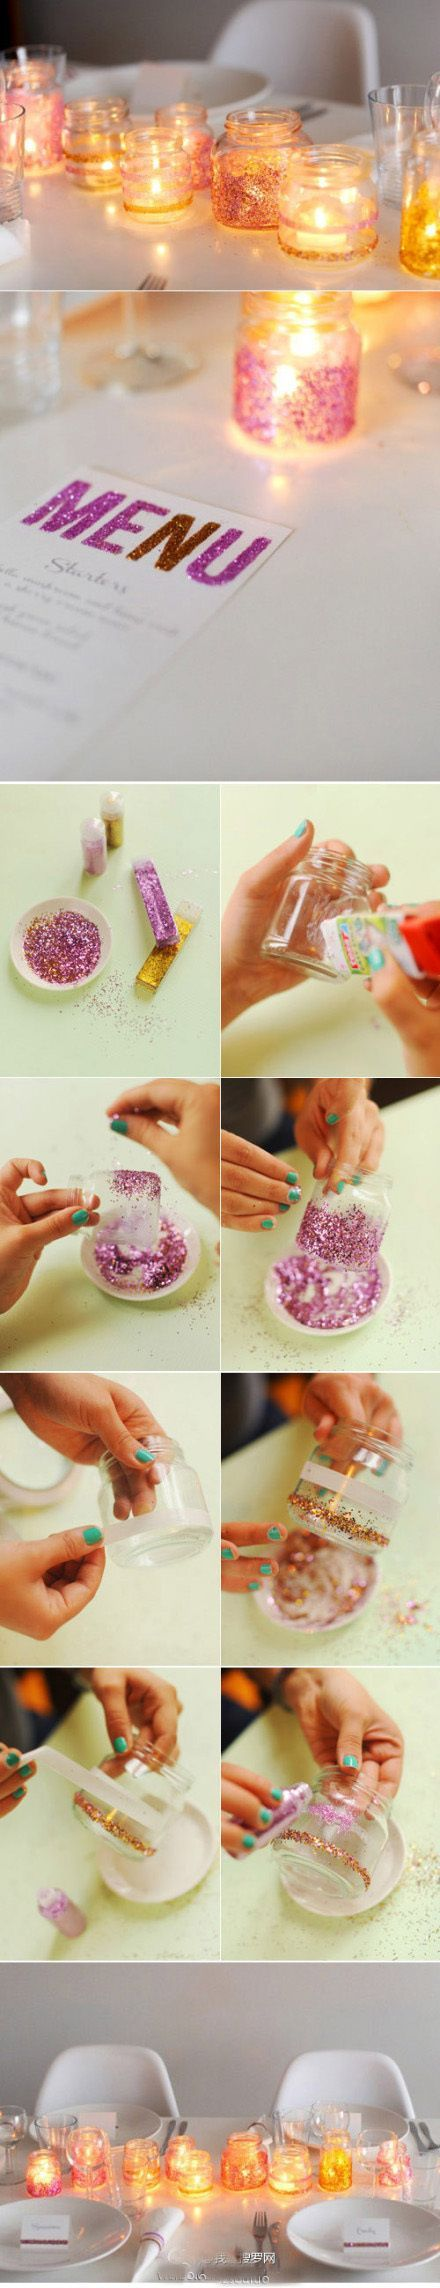 Glass Decoration Purpurin - Frascos decorados con escarcha #DIY #TUTORIAL #LINK